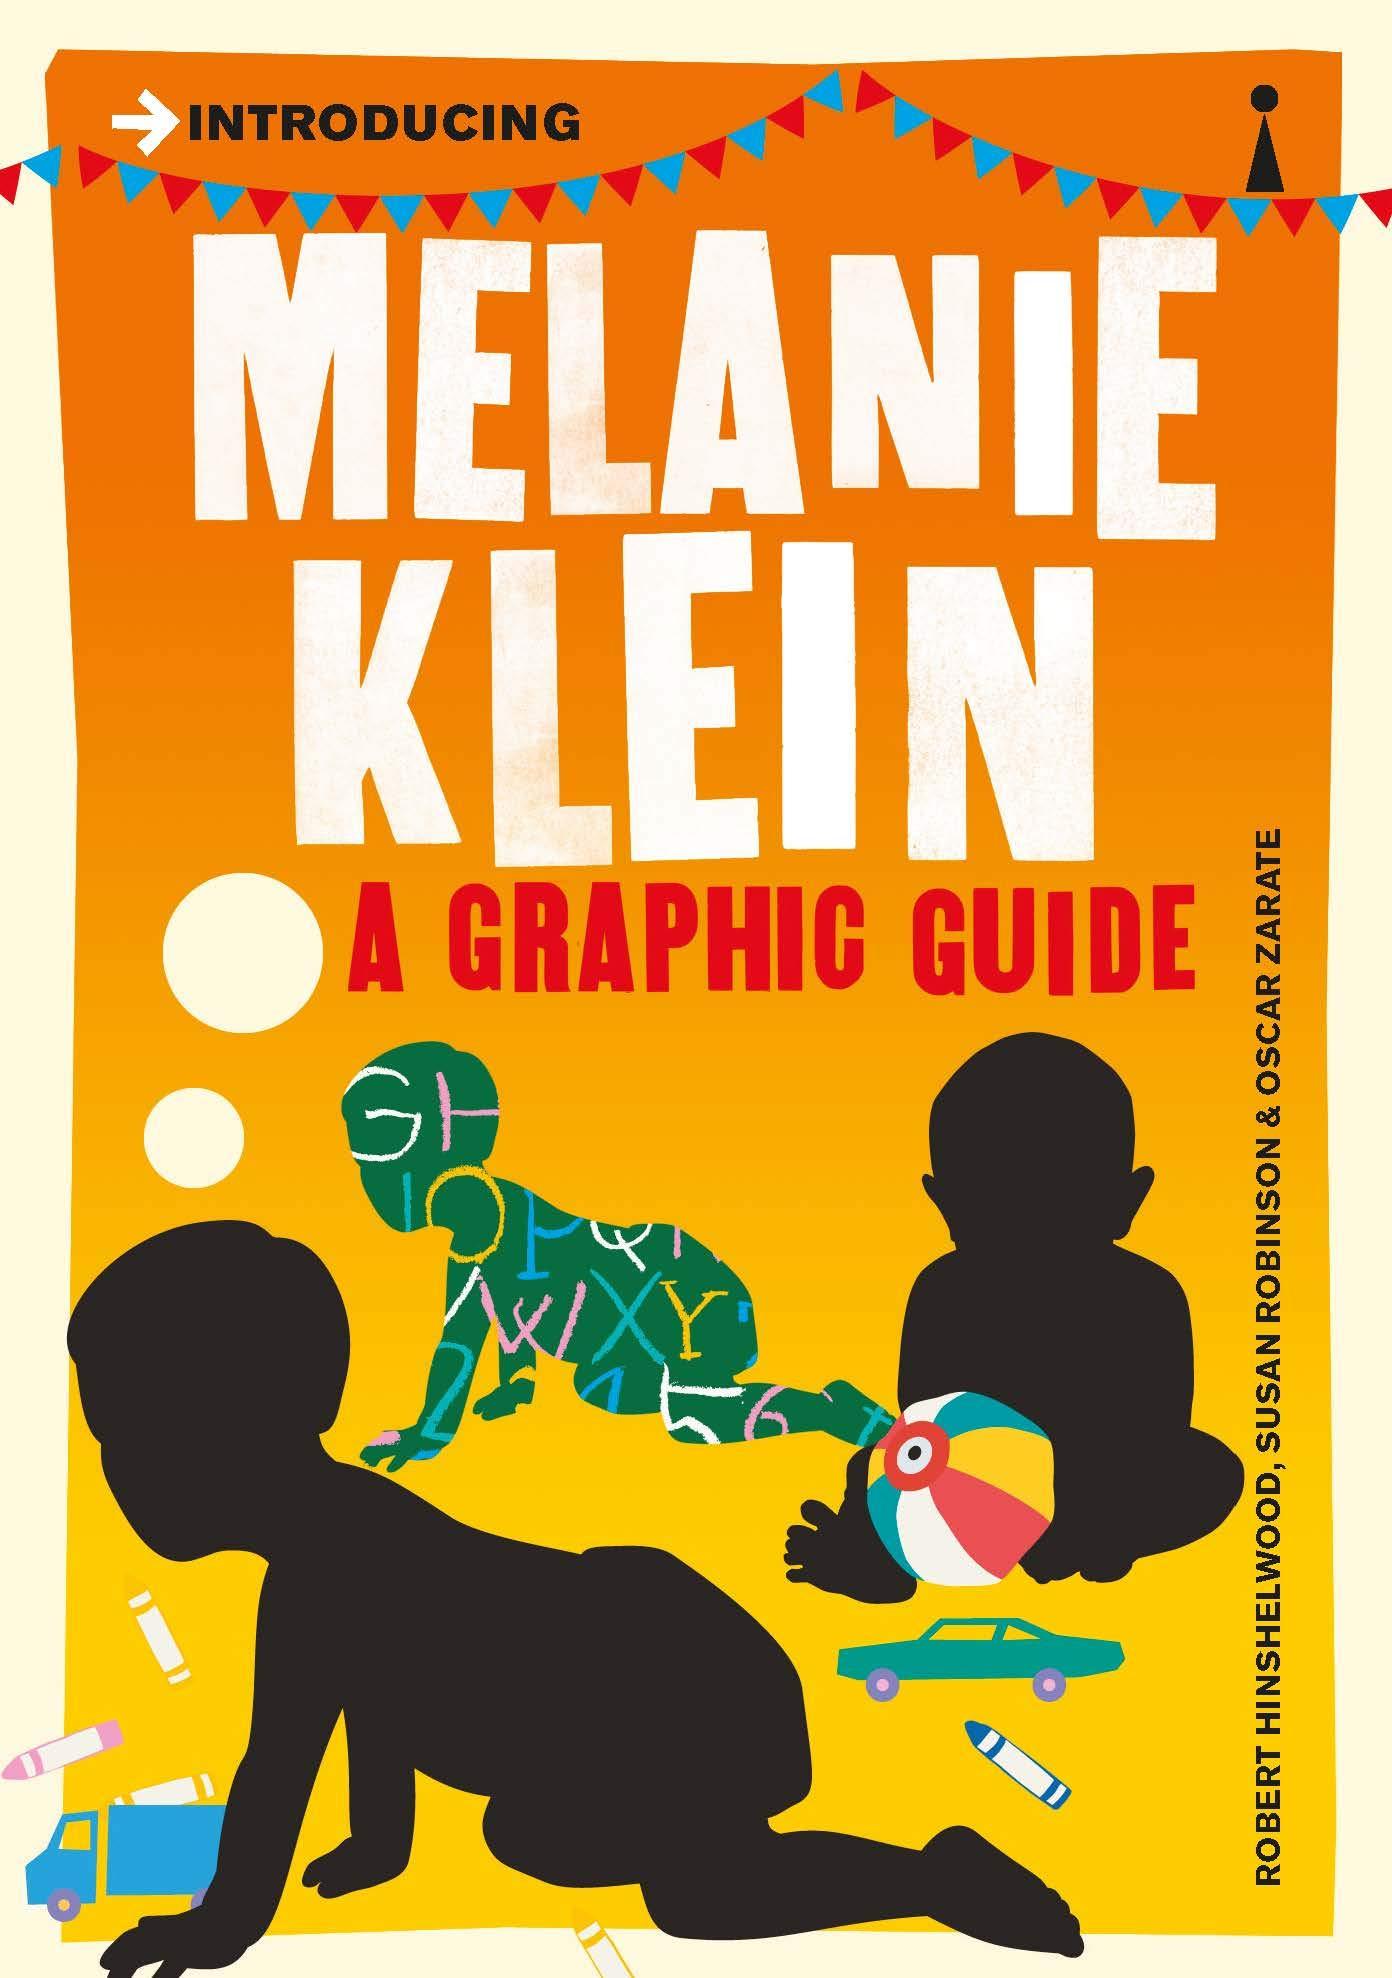 Introducing Melanie Klein  A Graphic Guide